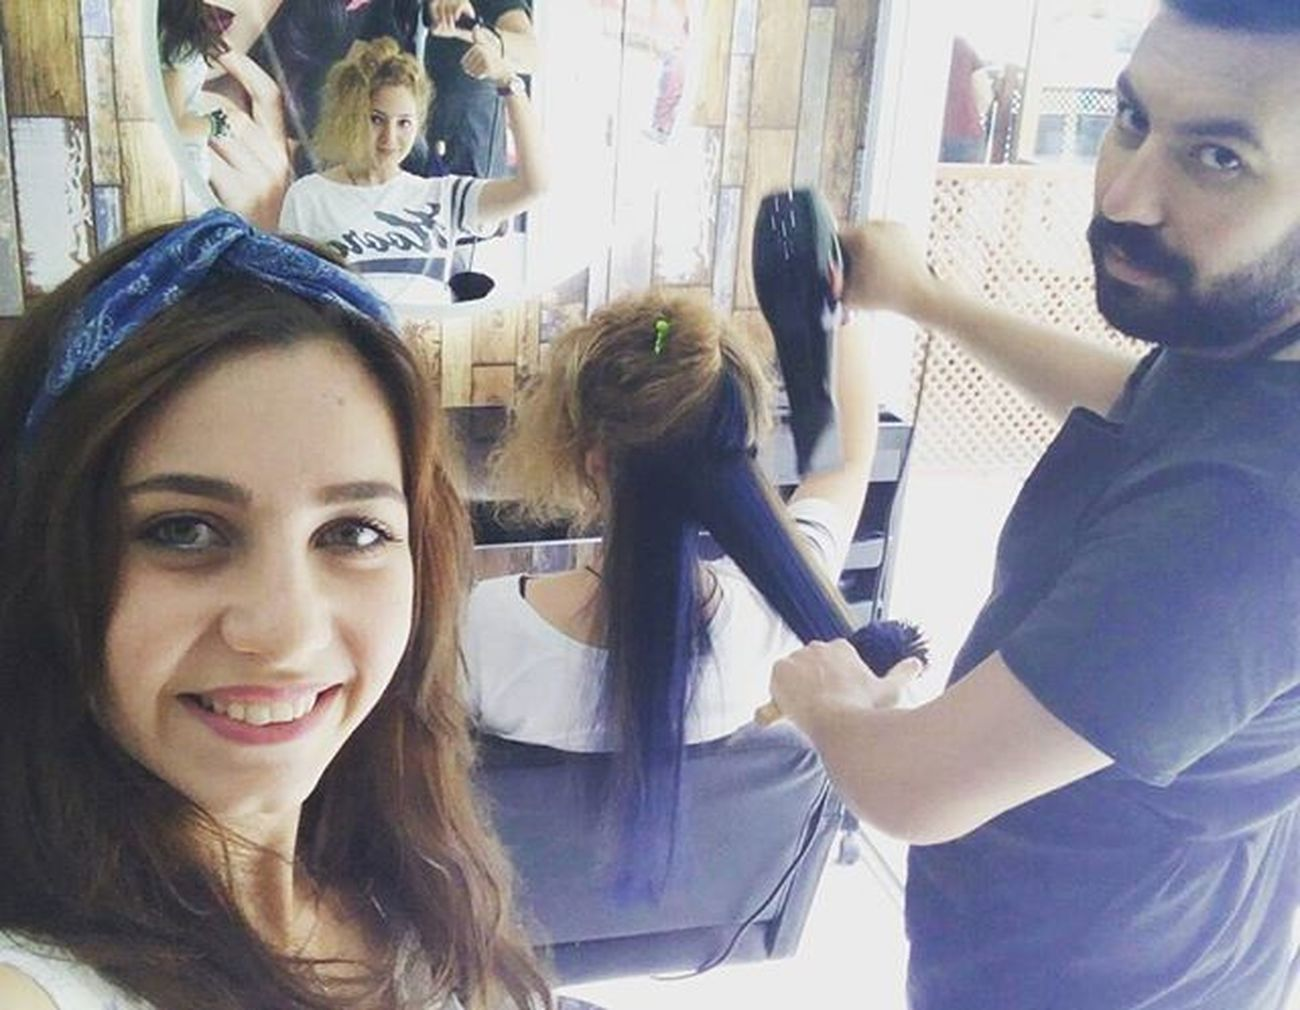 Woman Hairdresser Hairstyle Hair Hairstylist Haircolor Blue Coiffure Girls And Man Salonizmir Saçtasarım